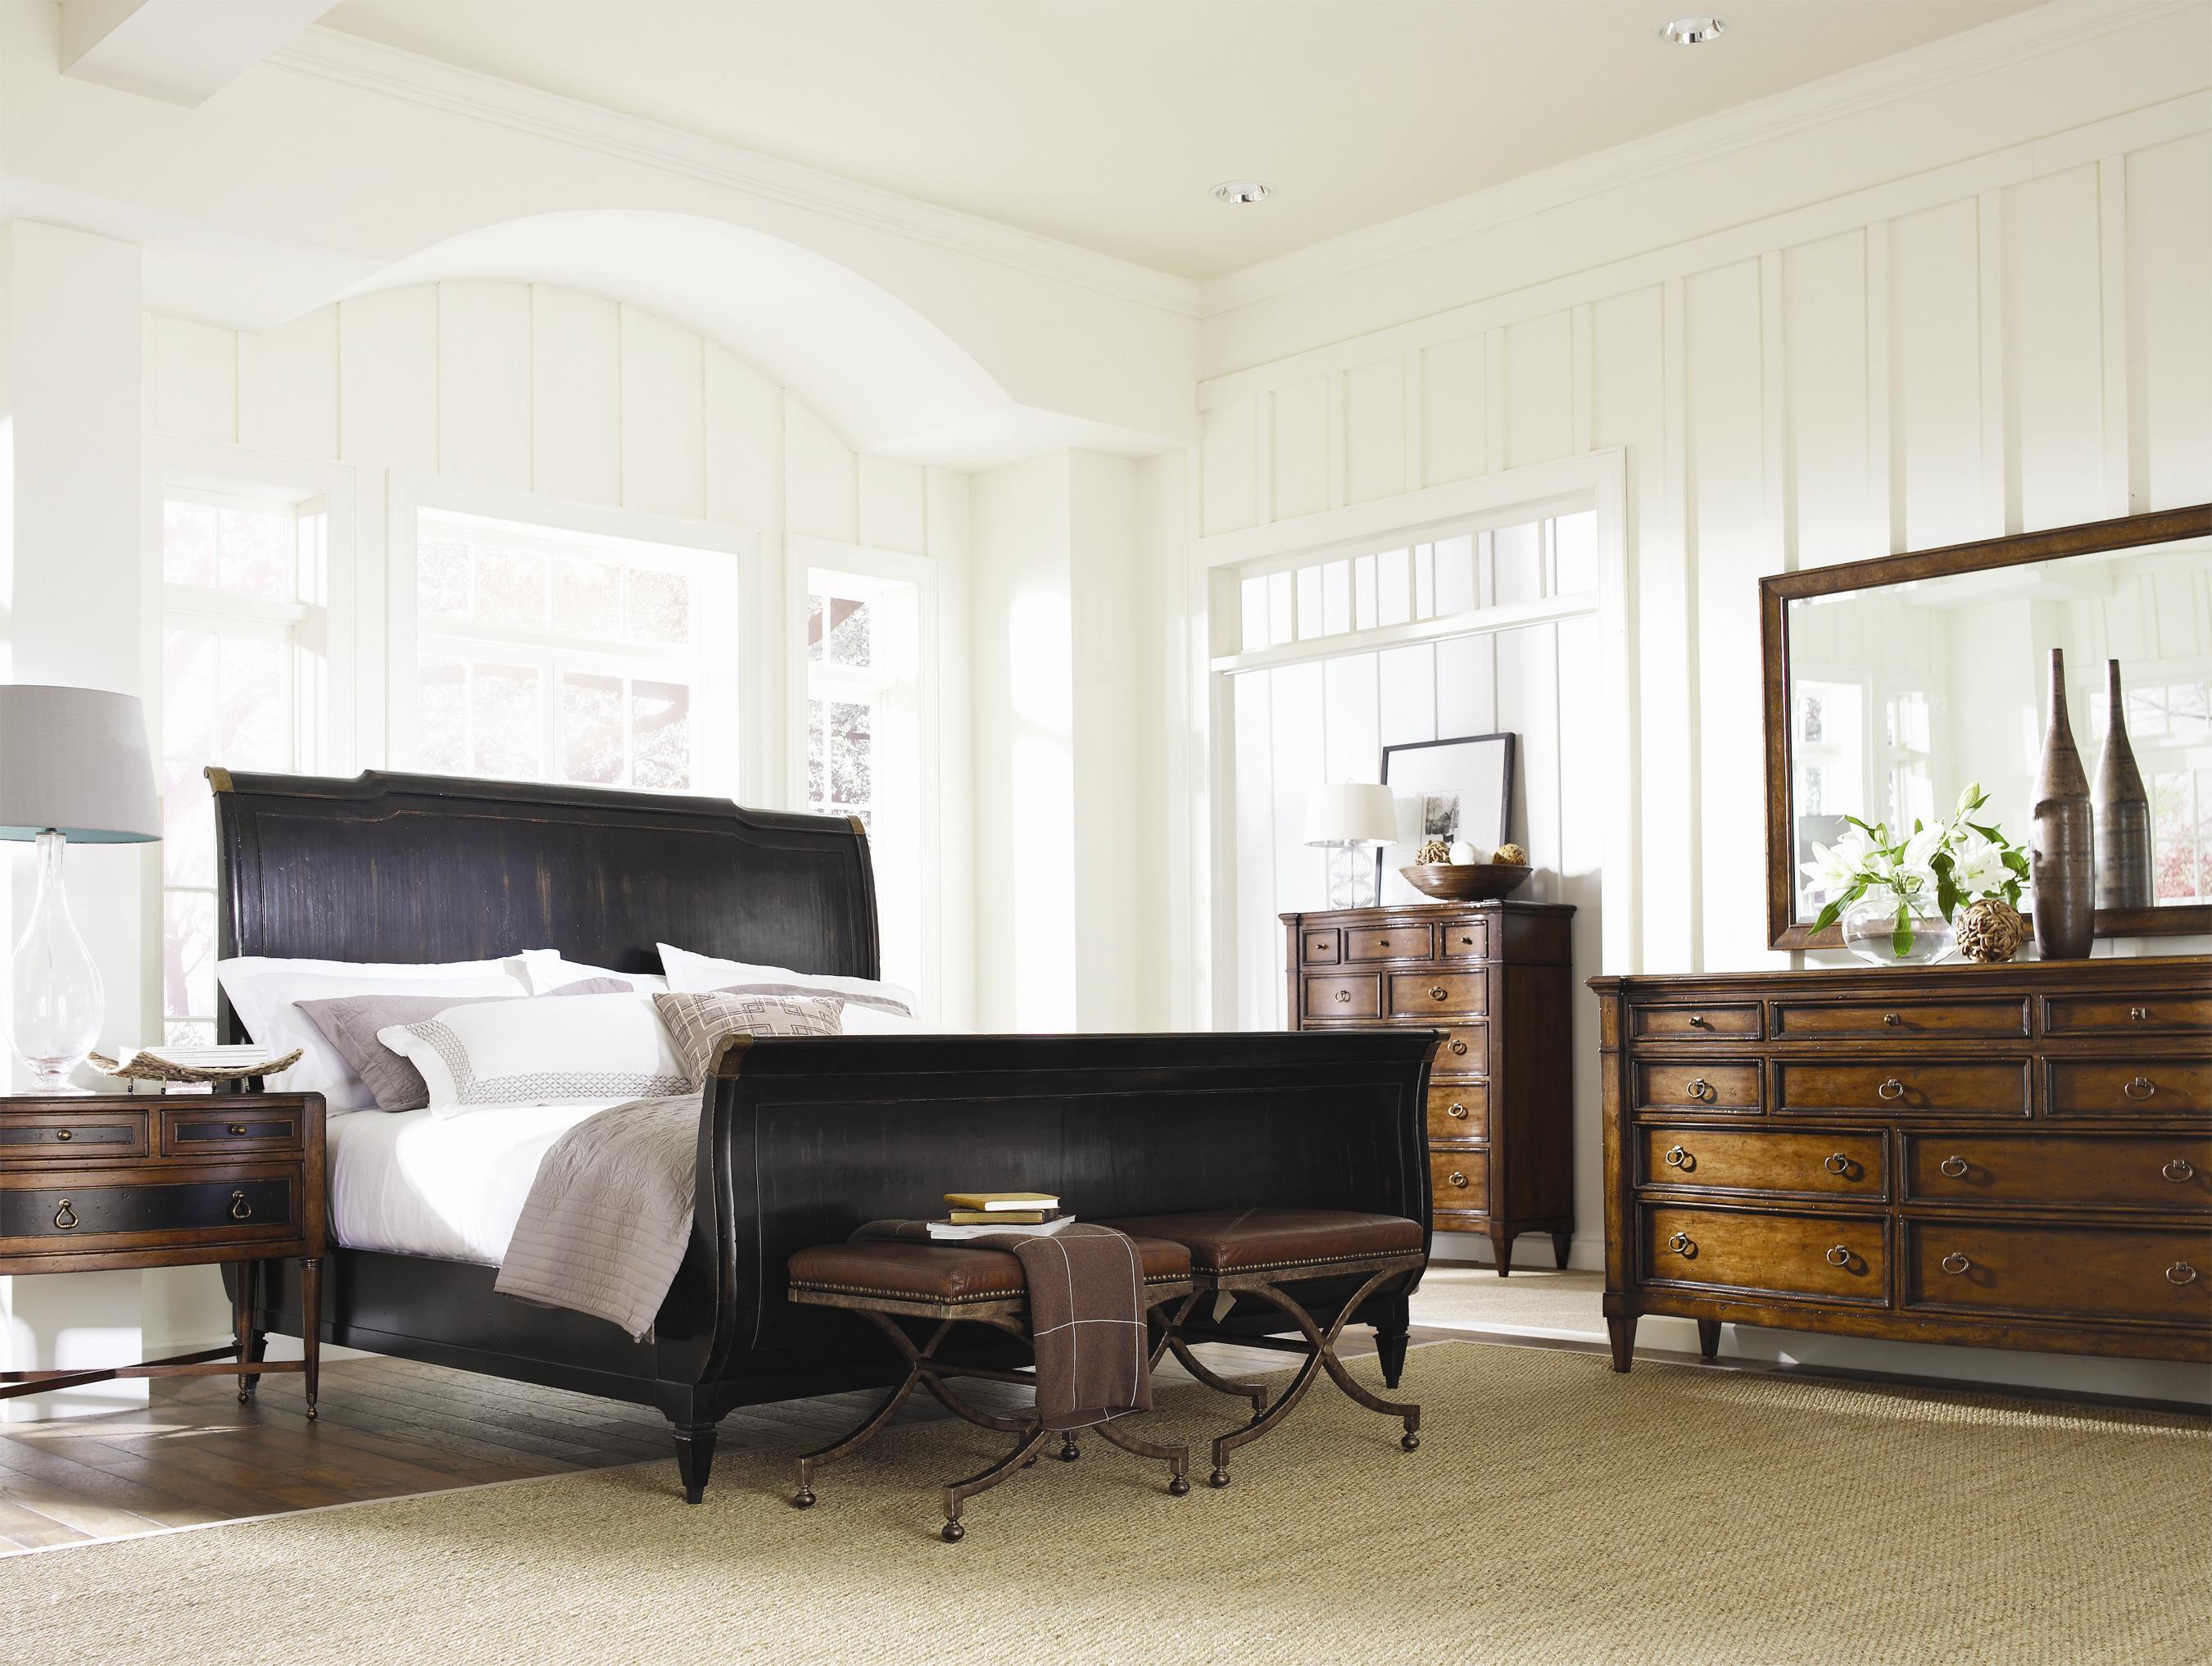 Schnadig Bedroom Furniture Schnadig American Kaleidoscope California King Sleigh Headboard